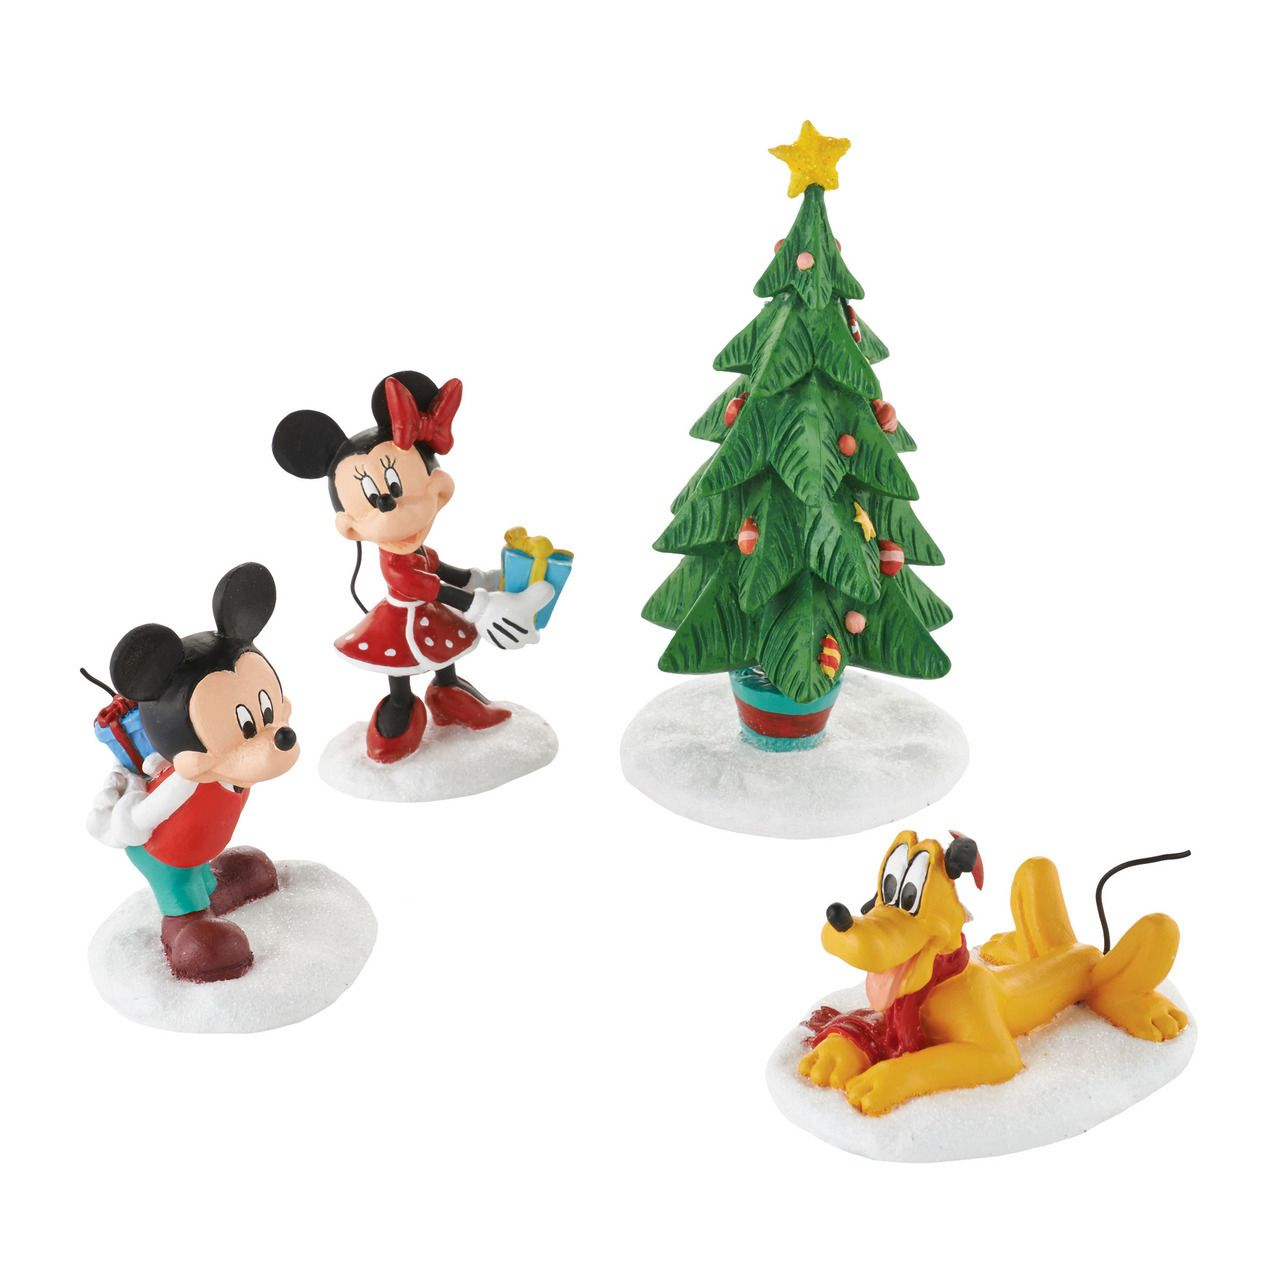 DEPT 56 DISNEY MICKEY/'S CHRISTMAS VILLAGE MICKEY/'S TANGLED TANGO NIB